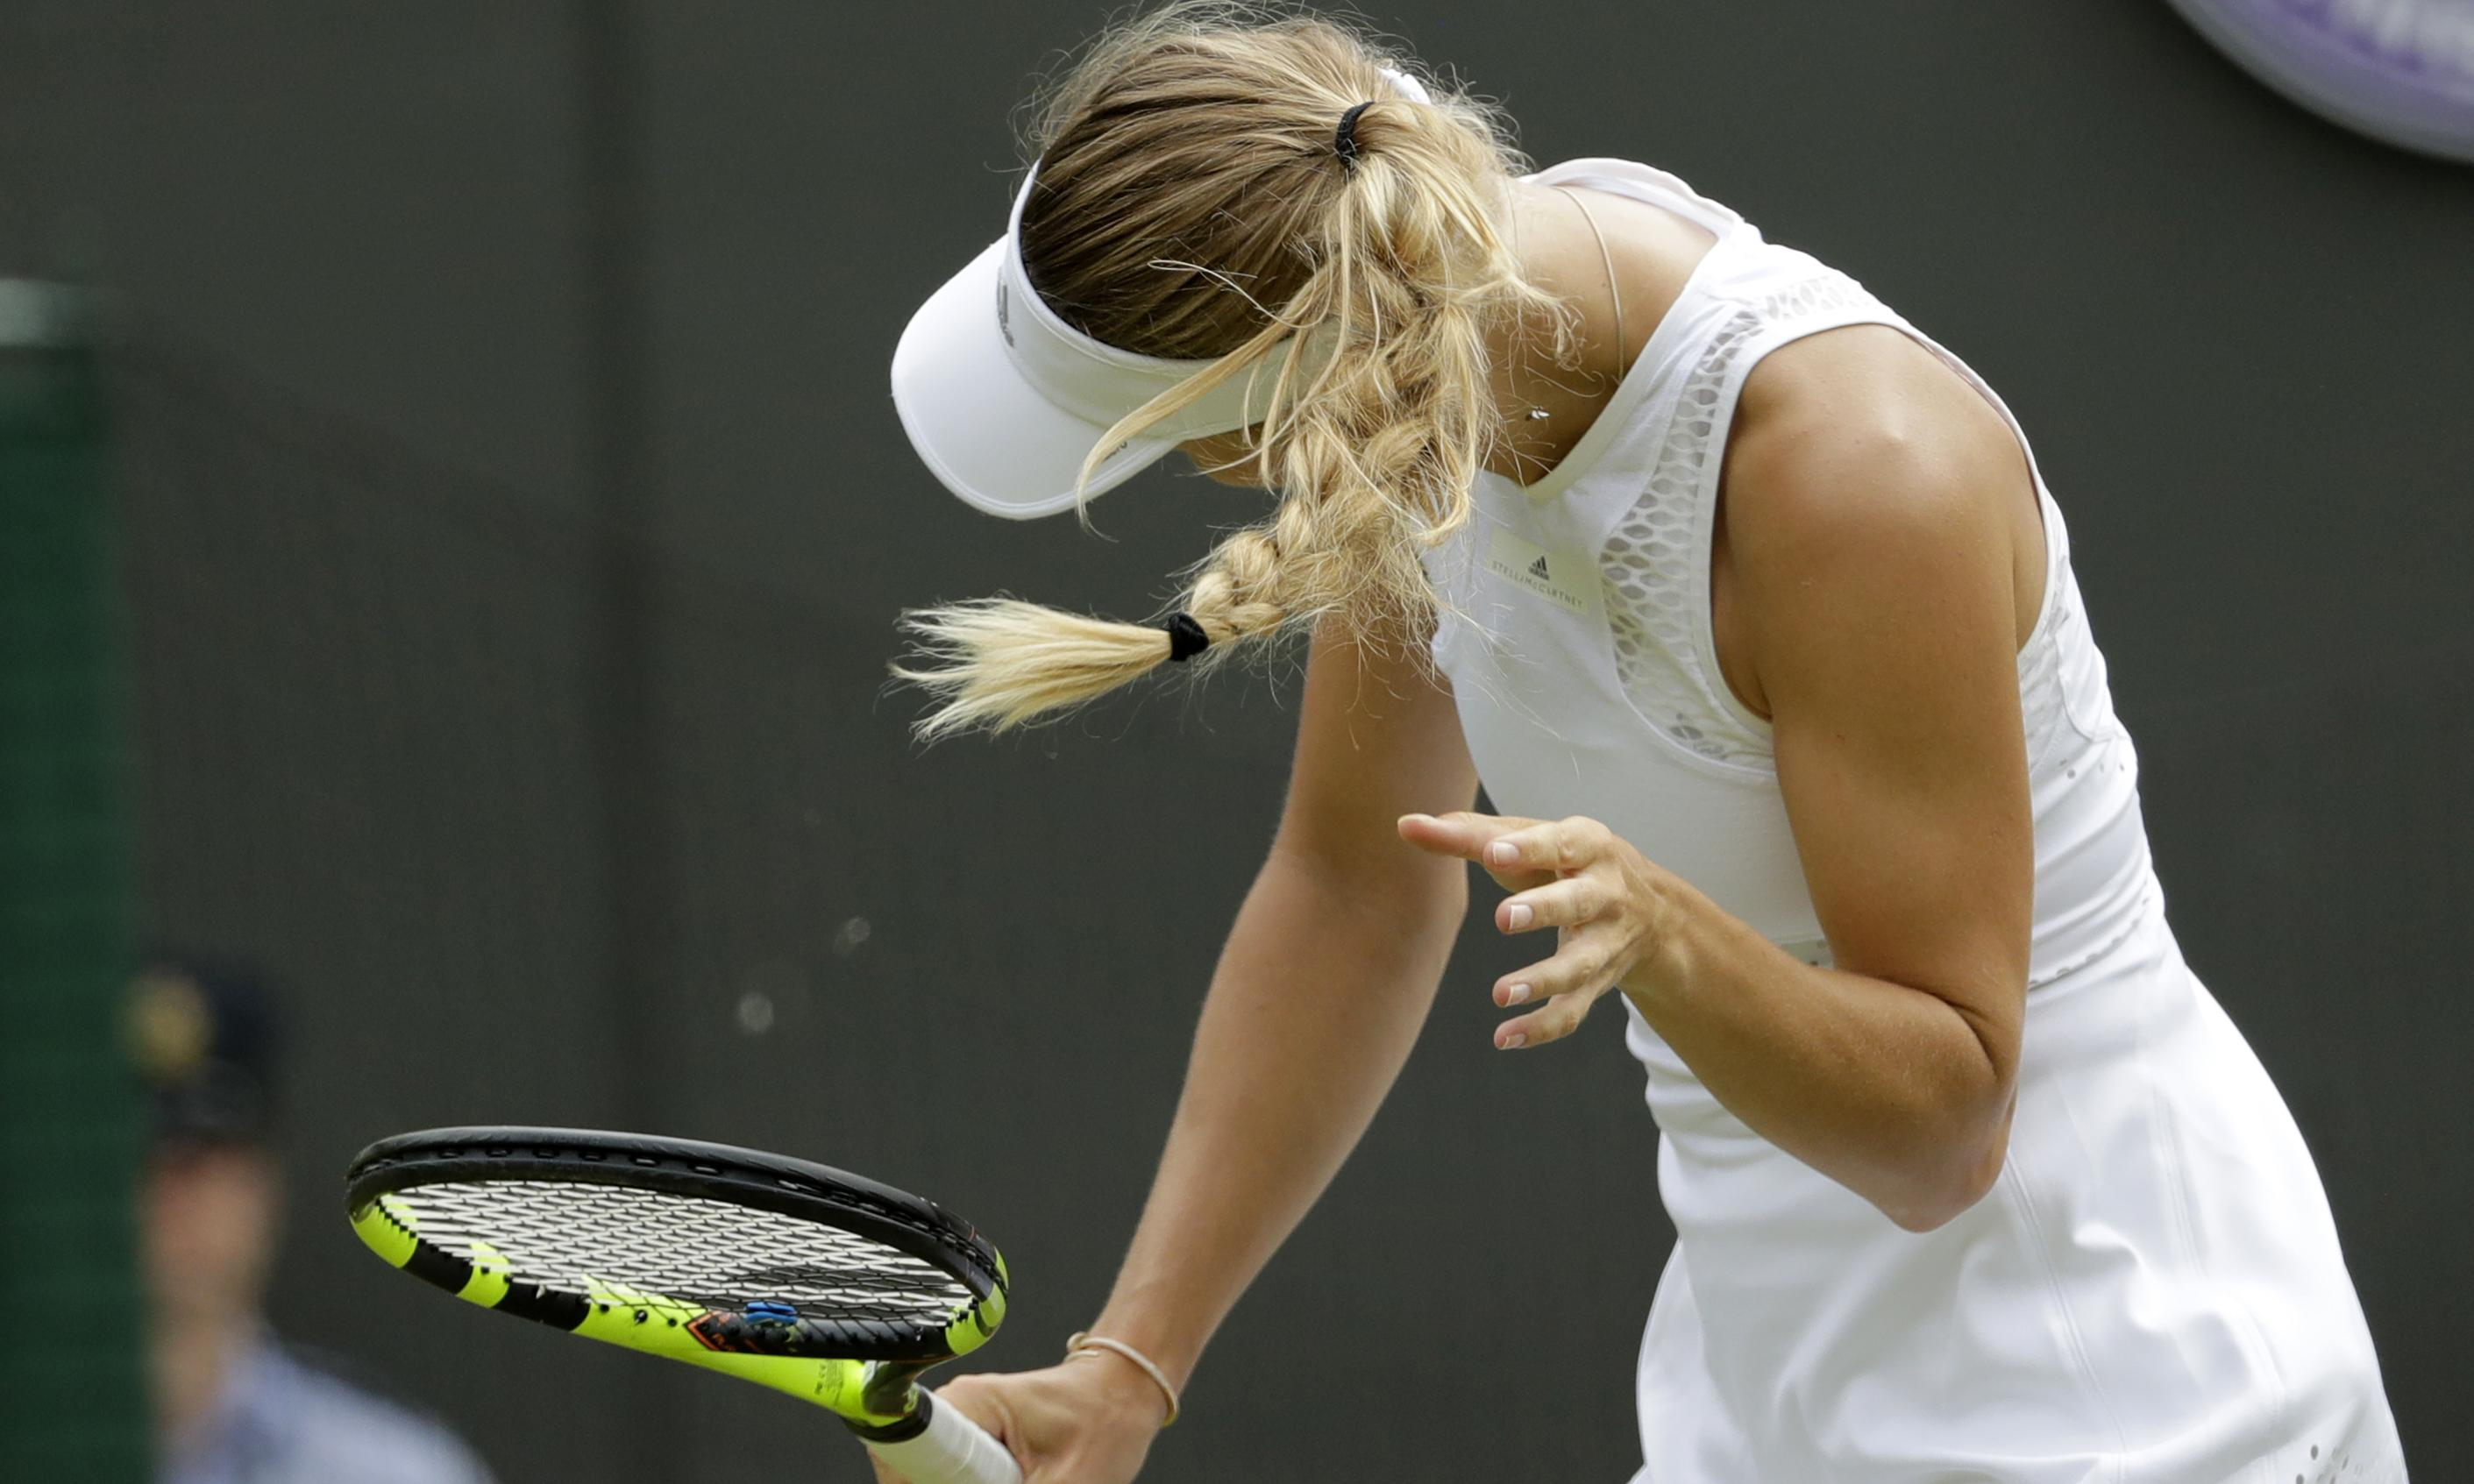 Caroline Wozniacki crashes out of Wimbledon after flying ant invasion